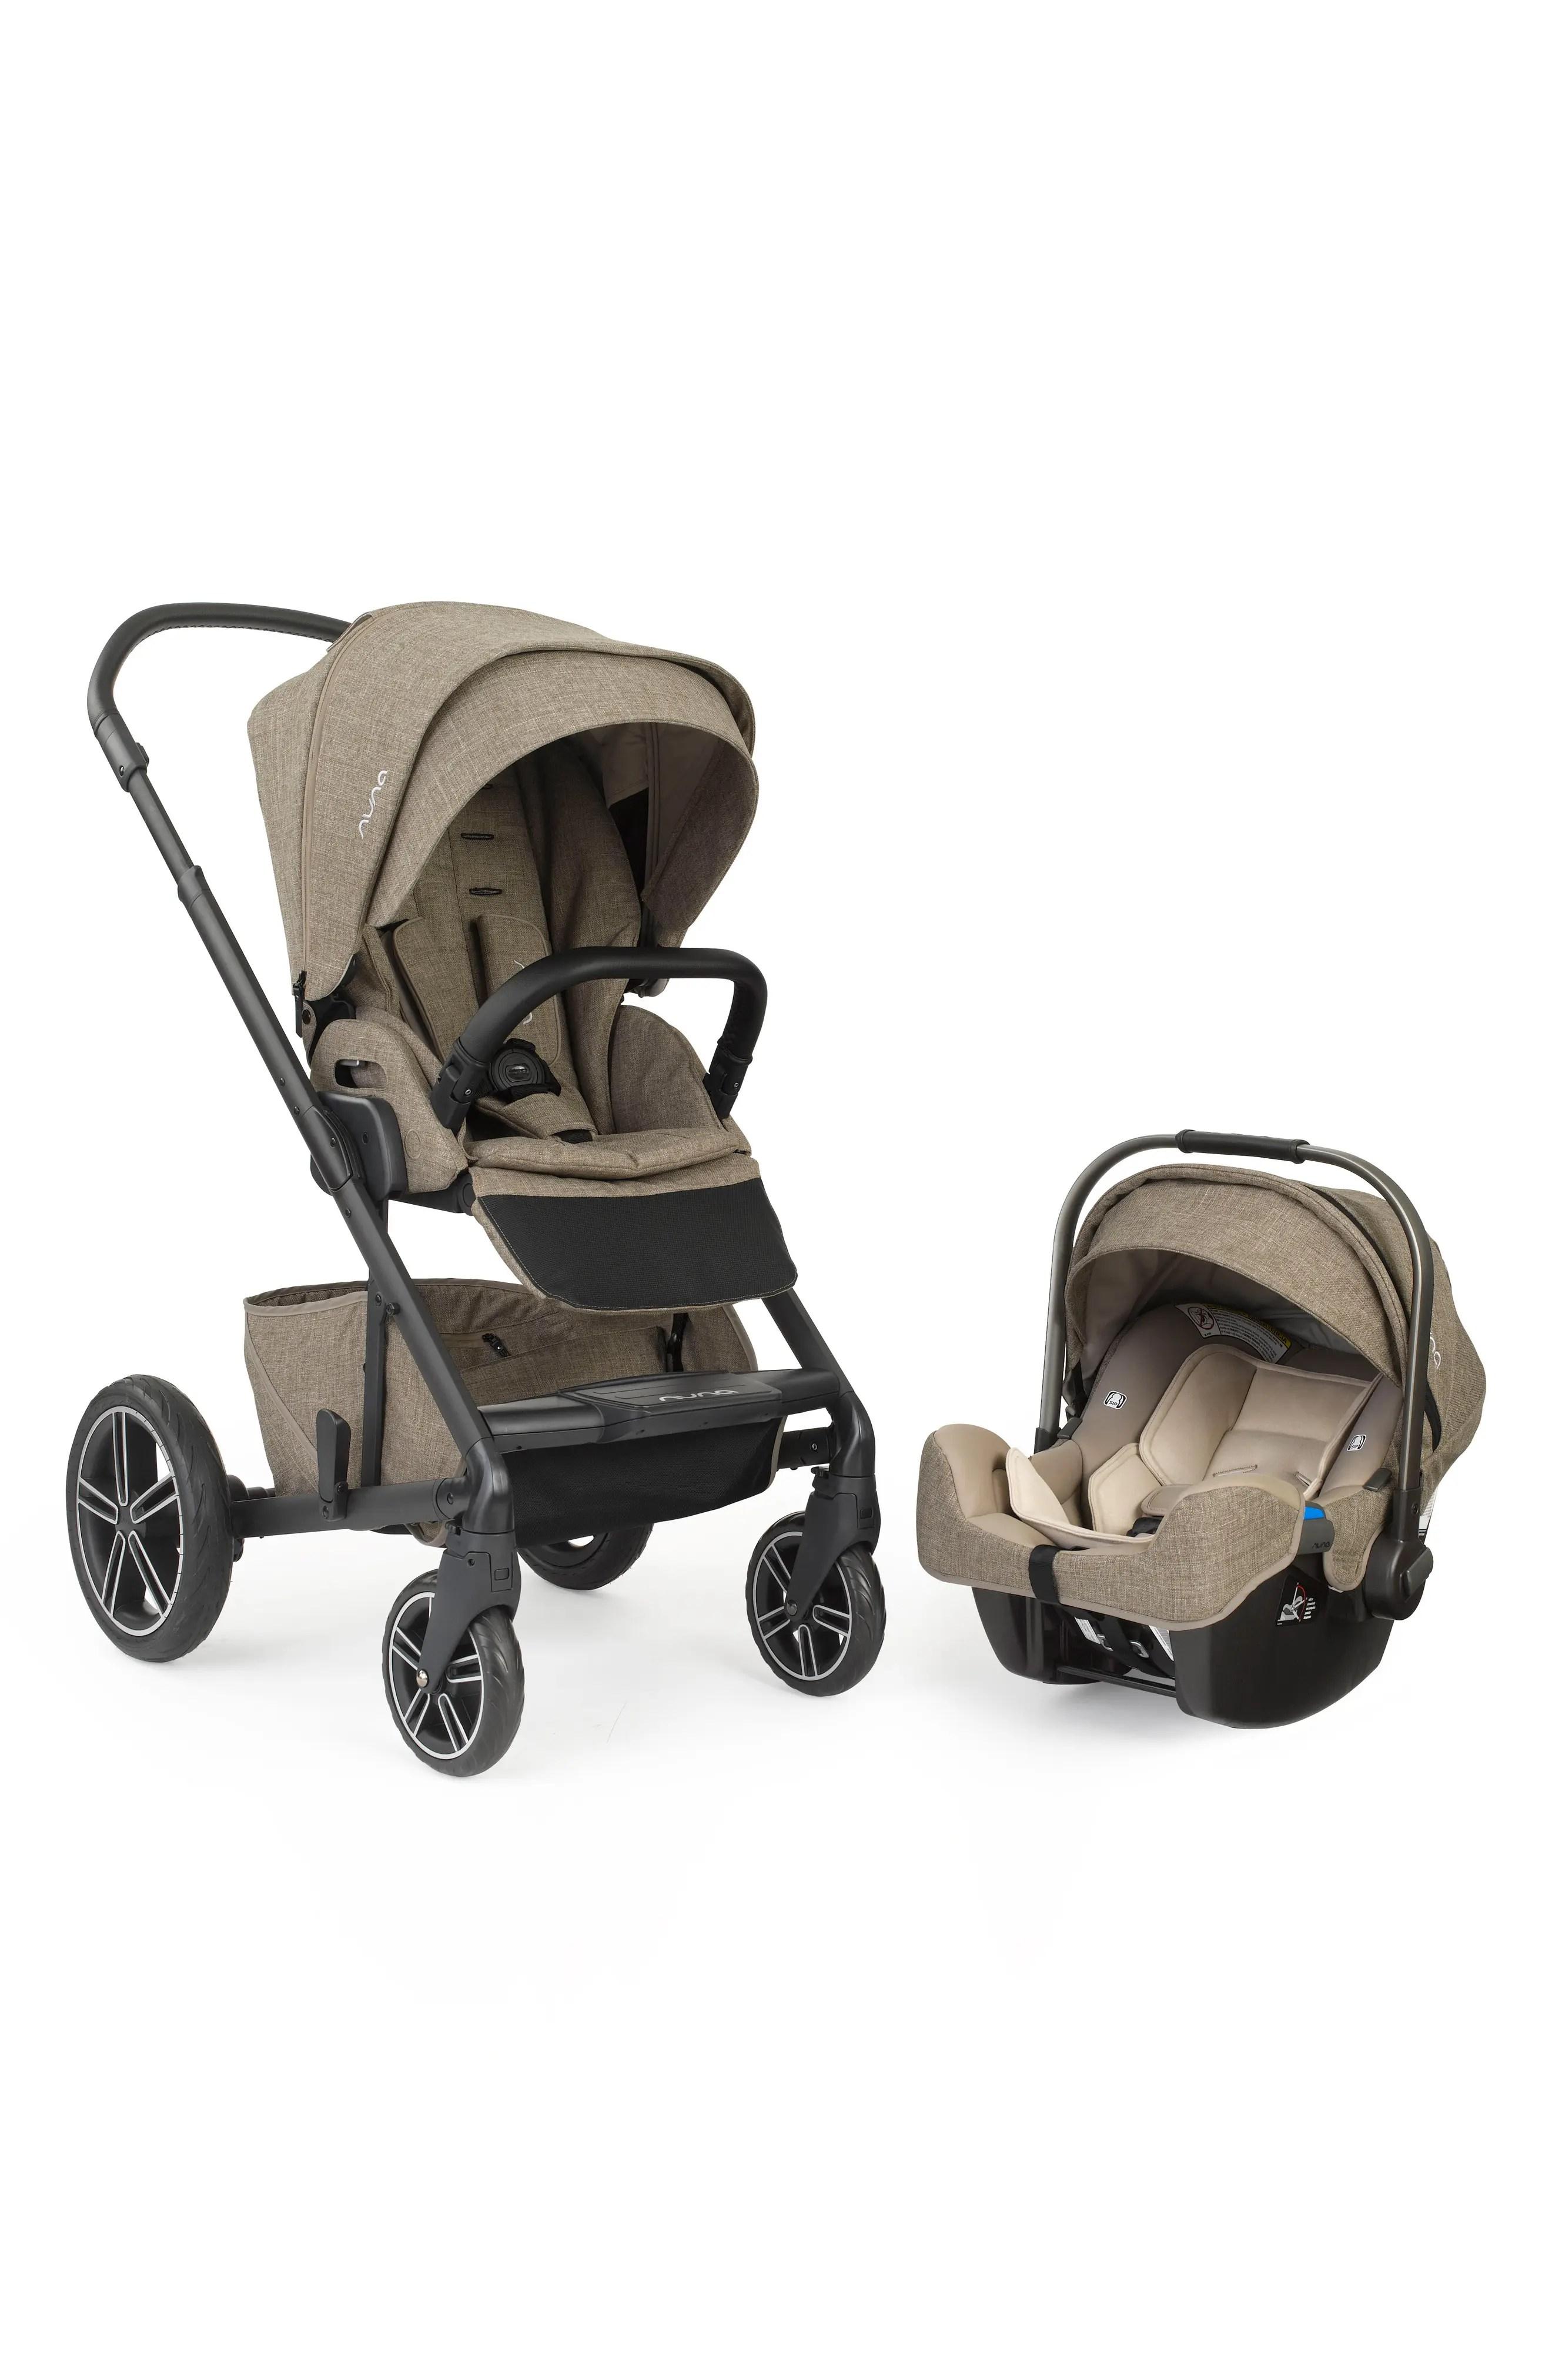 Exceptional Stroller System Nuna Stroller System Car Seat Set Nordstrom Nuna Mixx Stroller 2019 Nuna Mixx Stroller Amazon baby Nuna Mixx Stroller